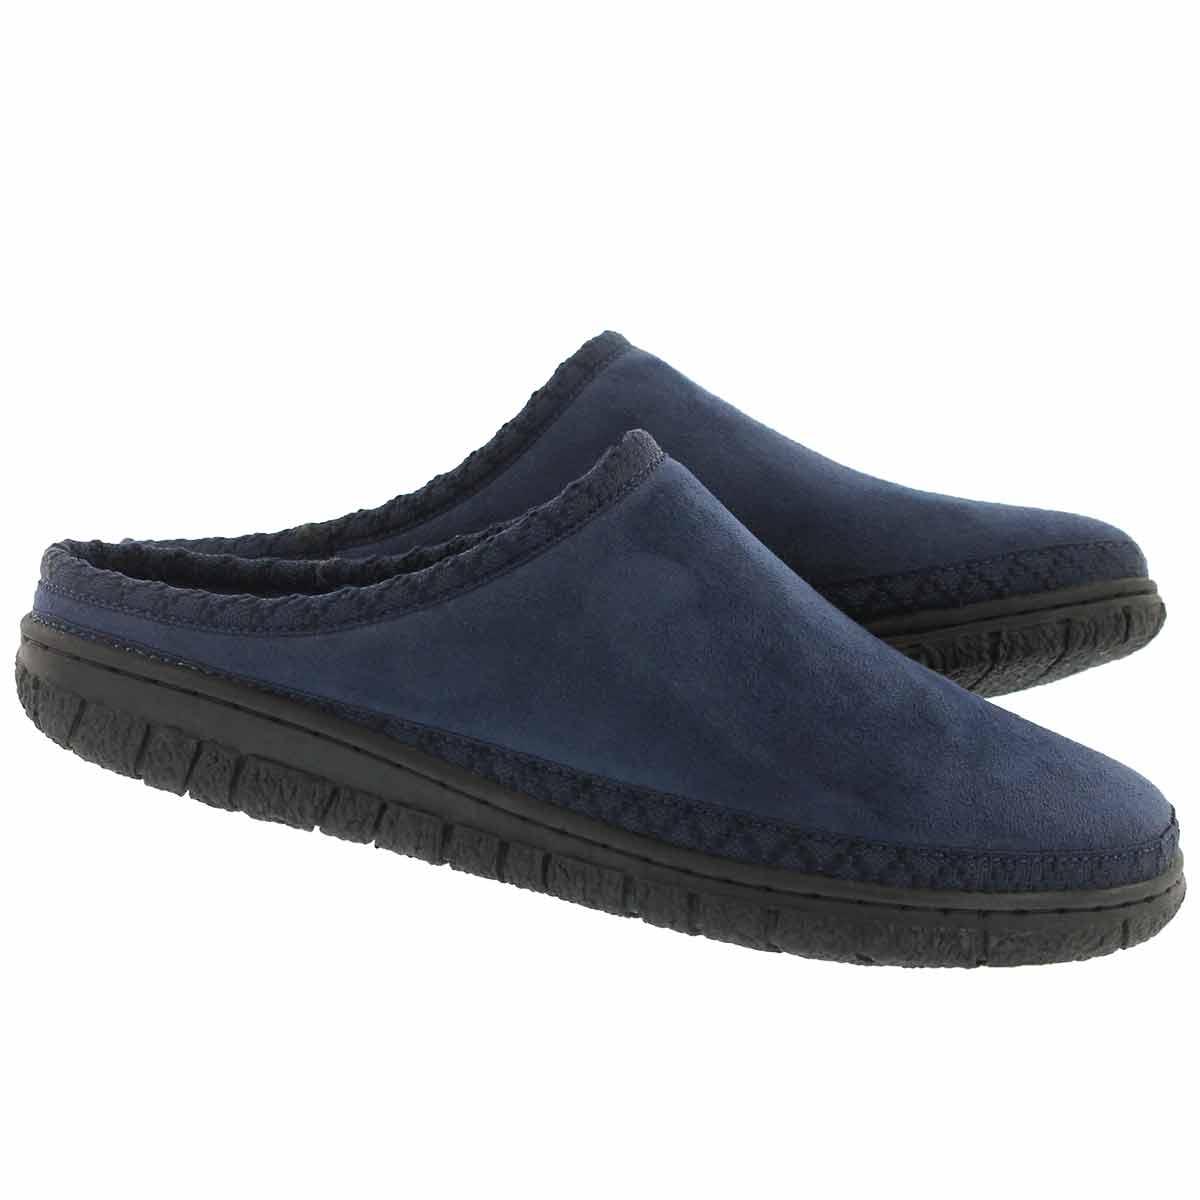 Lds Saturn nvy memory foam slipper